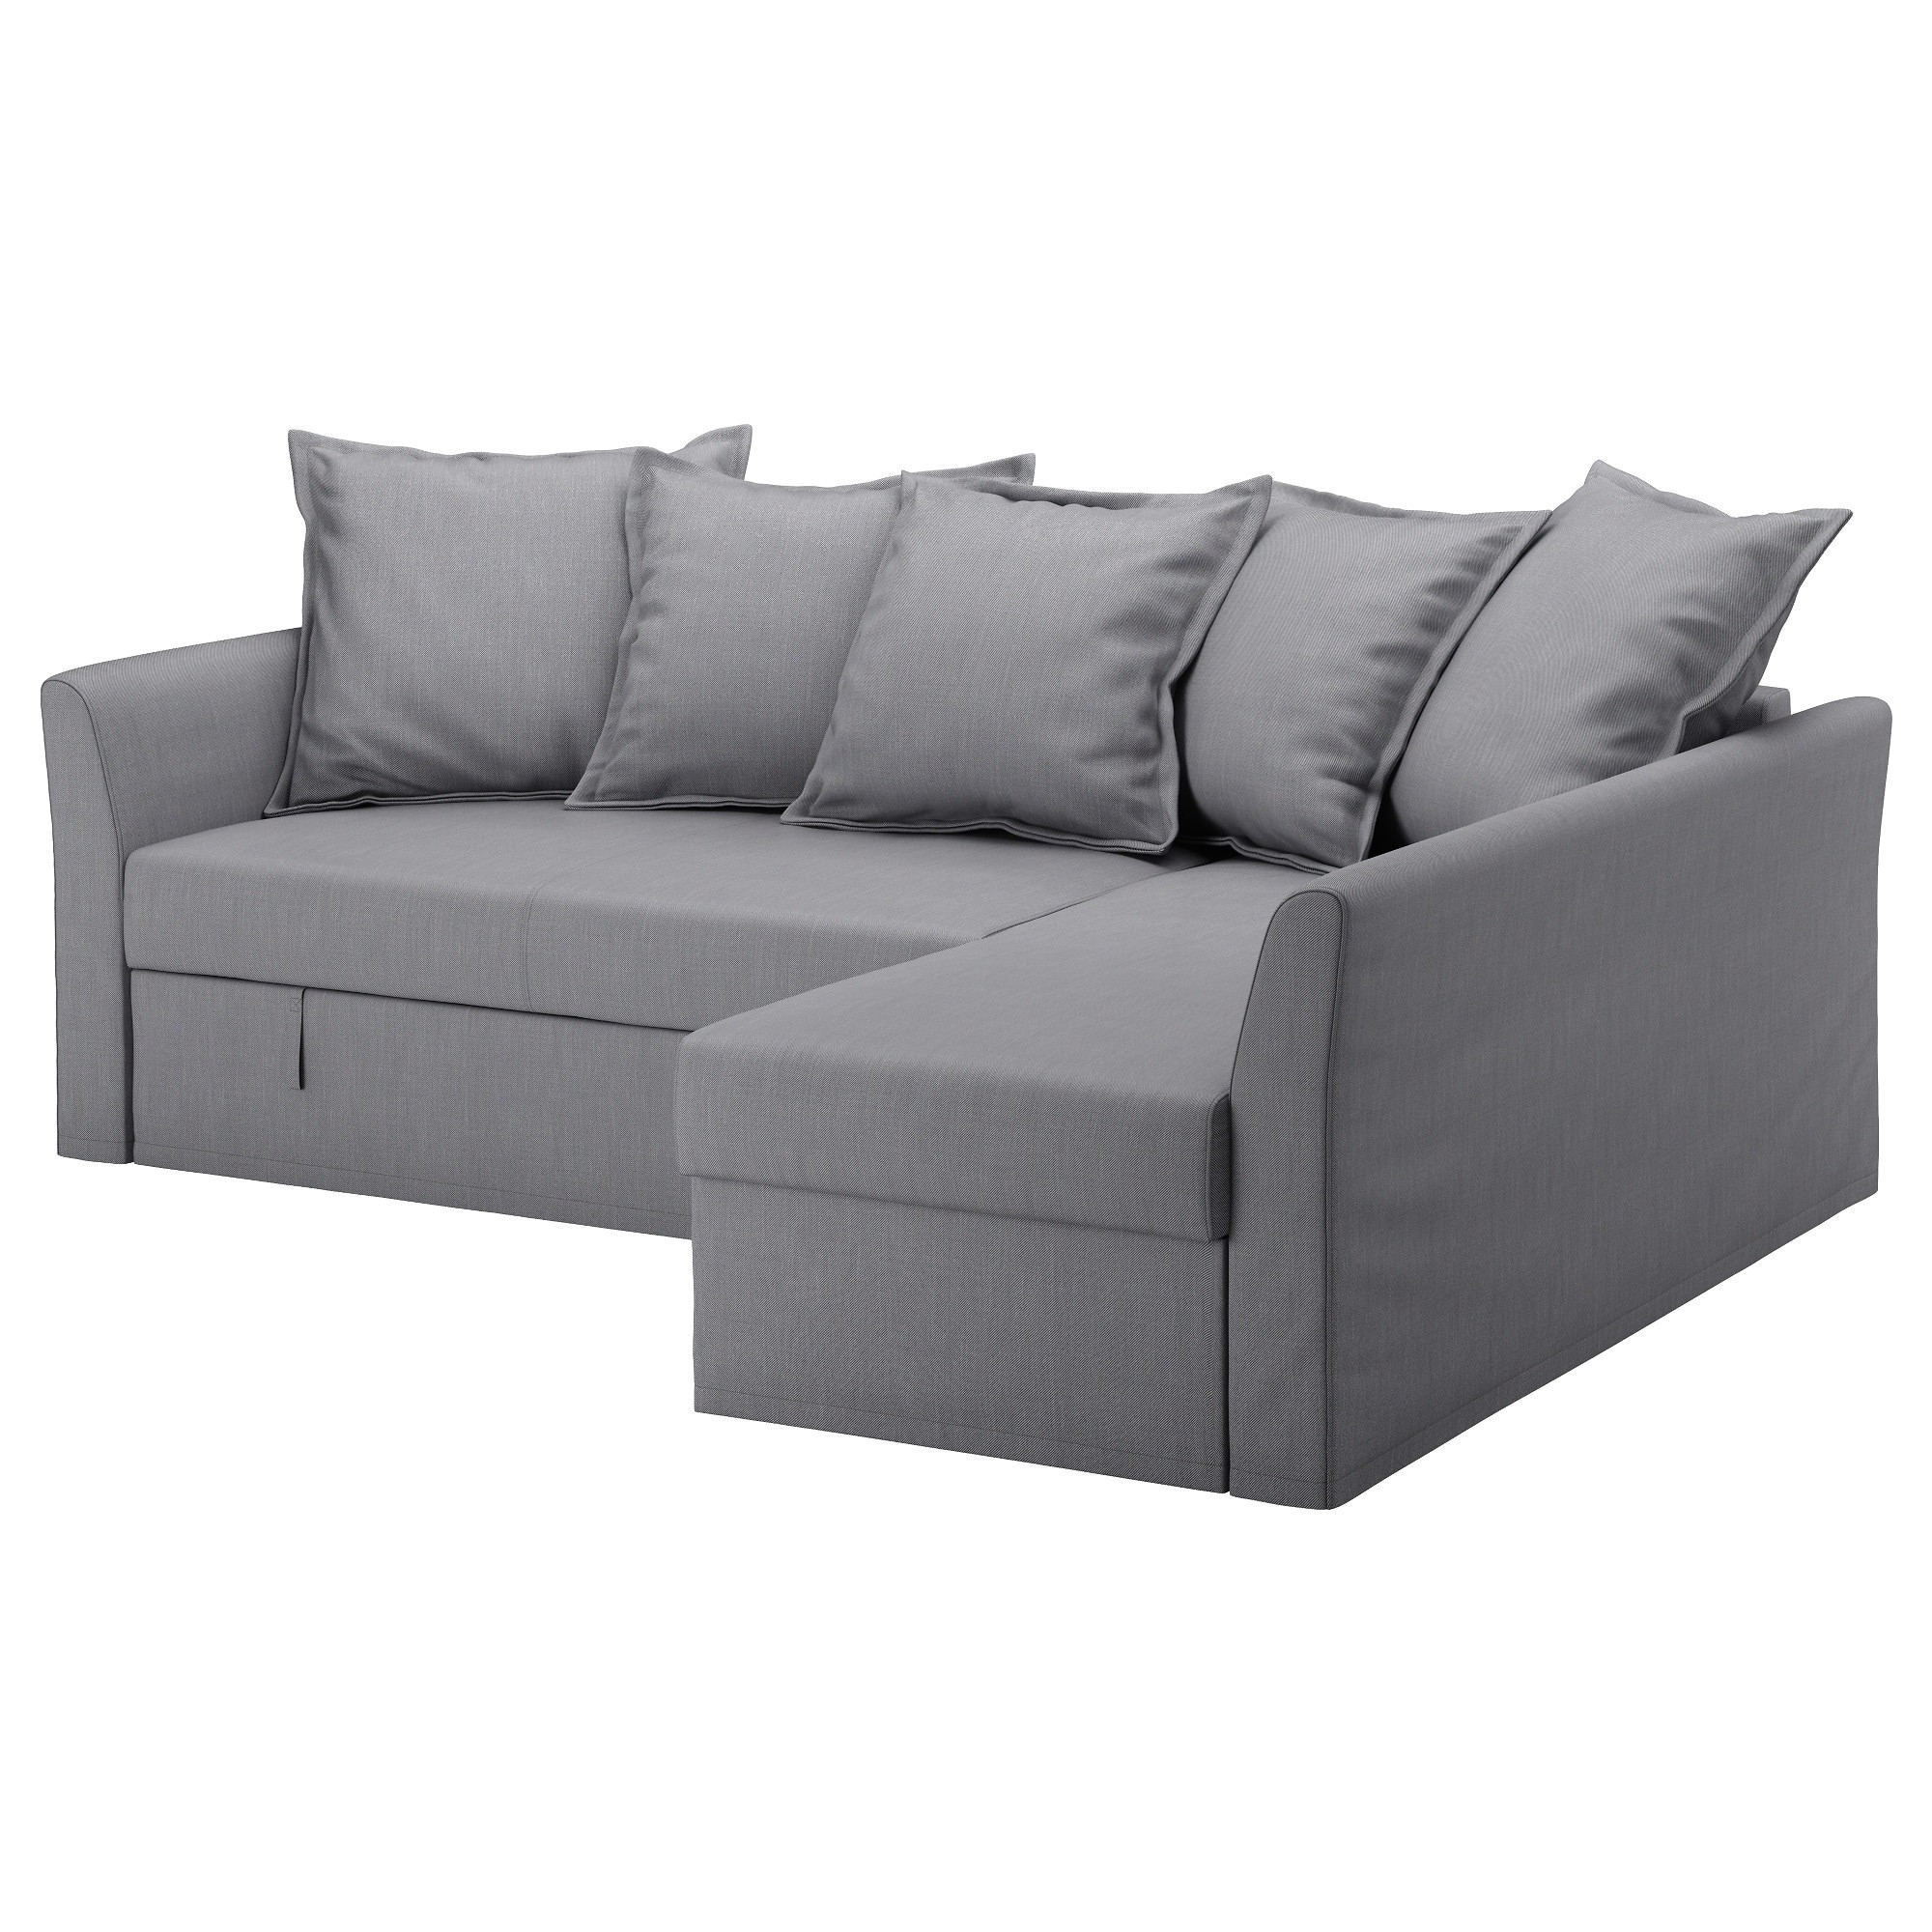 ikea schlafsofa solsta beste solsta sleeper sofa best fabulous sofa sleeper ikea galerie of ikea schlafsofa